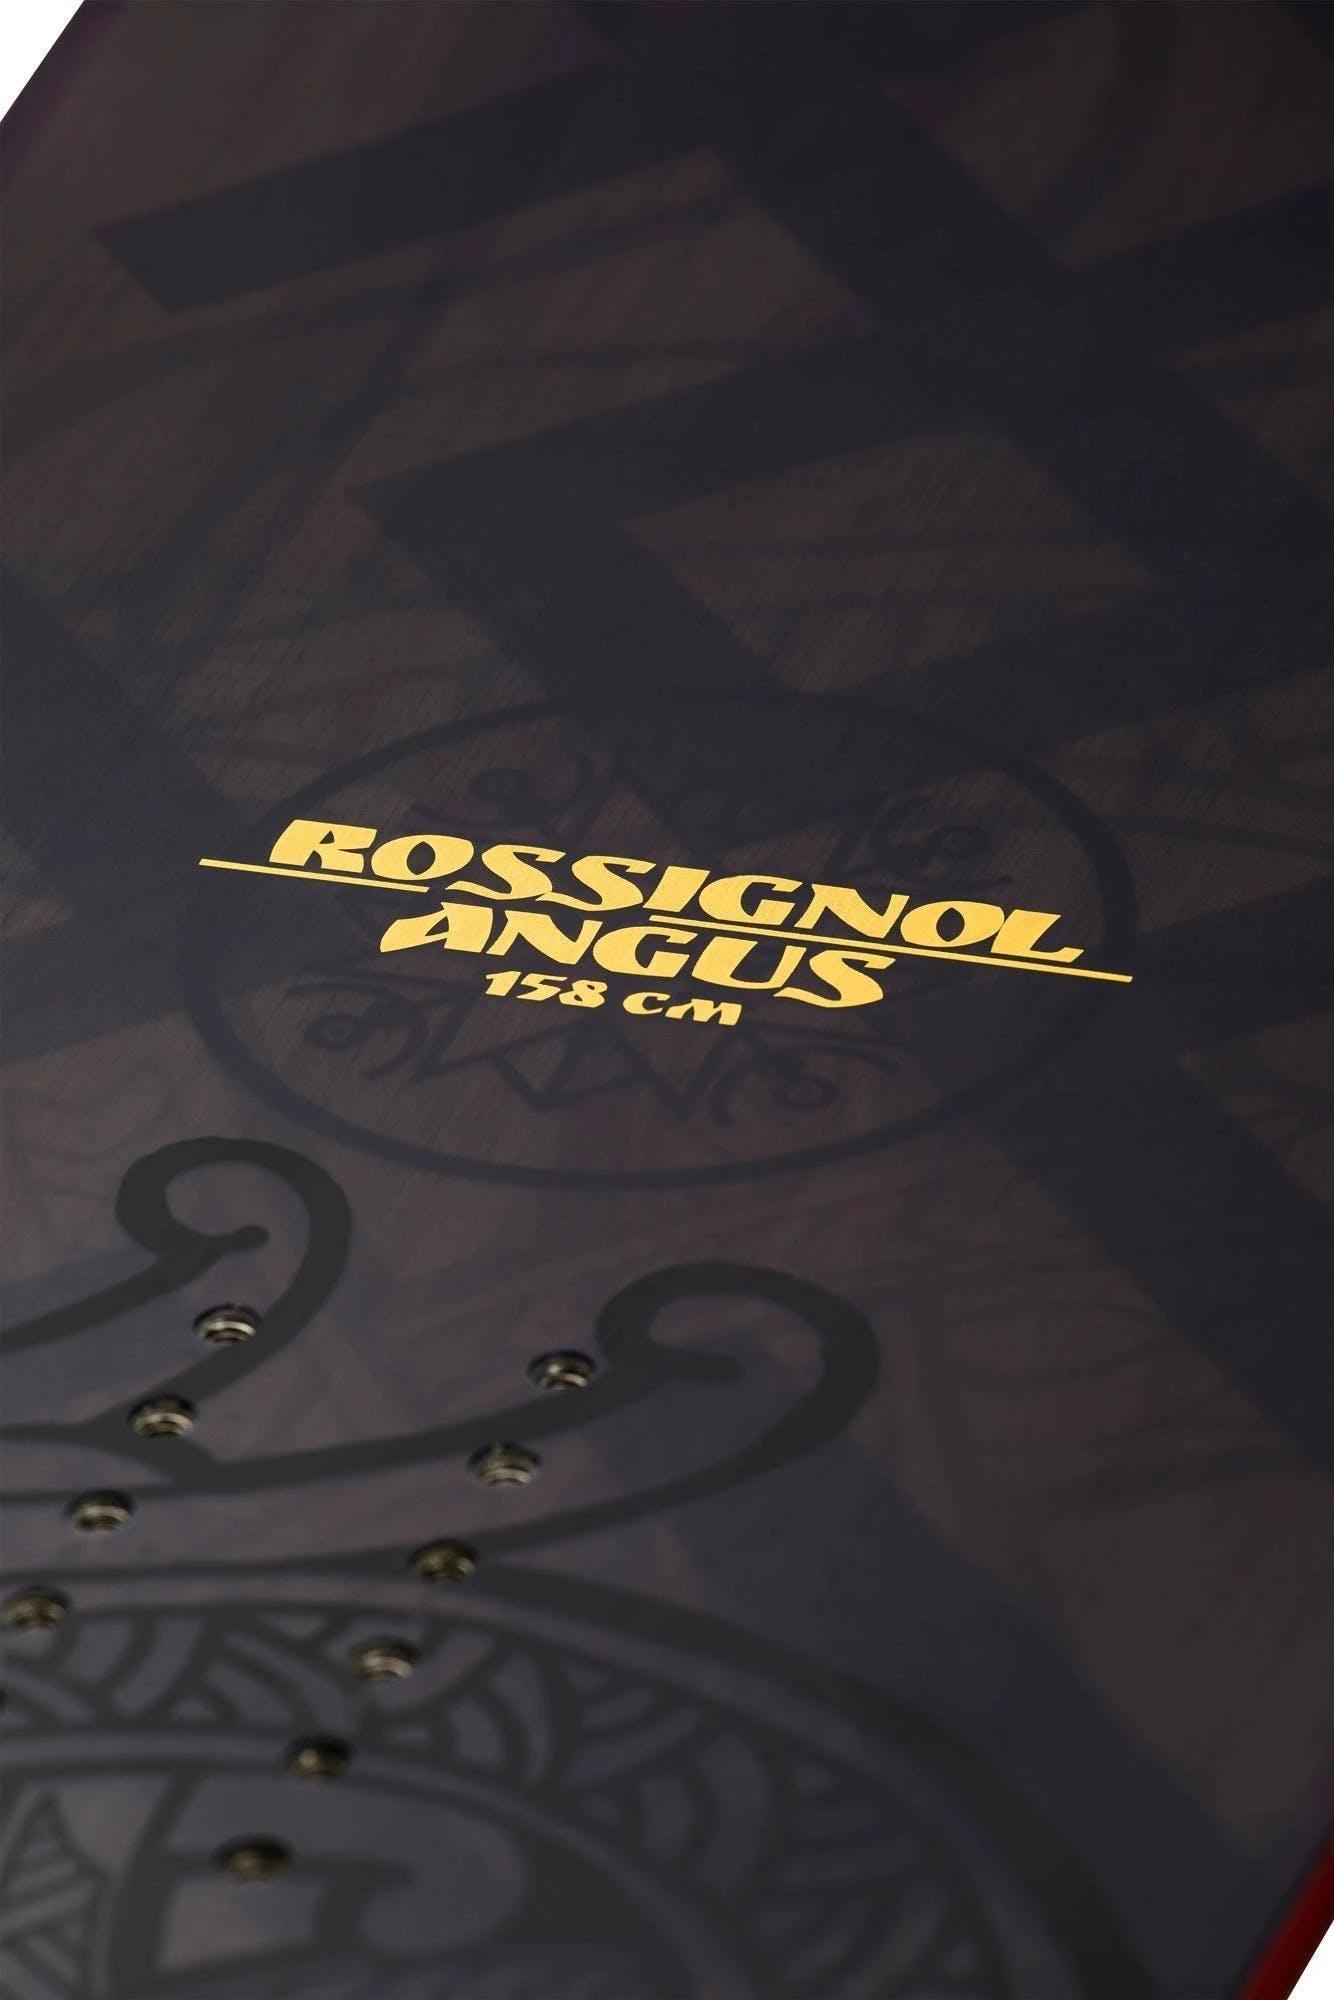 Rossignol Angus Snowboard · 2020